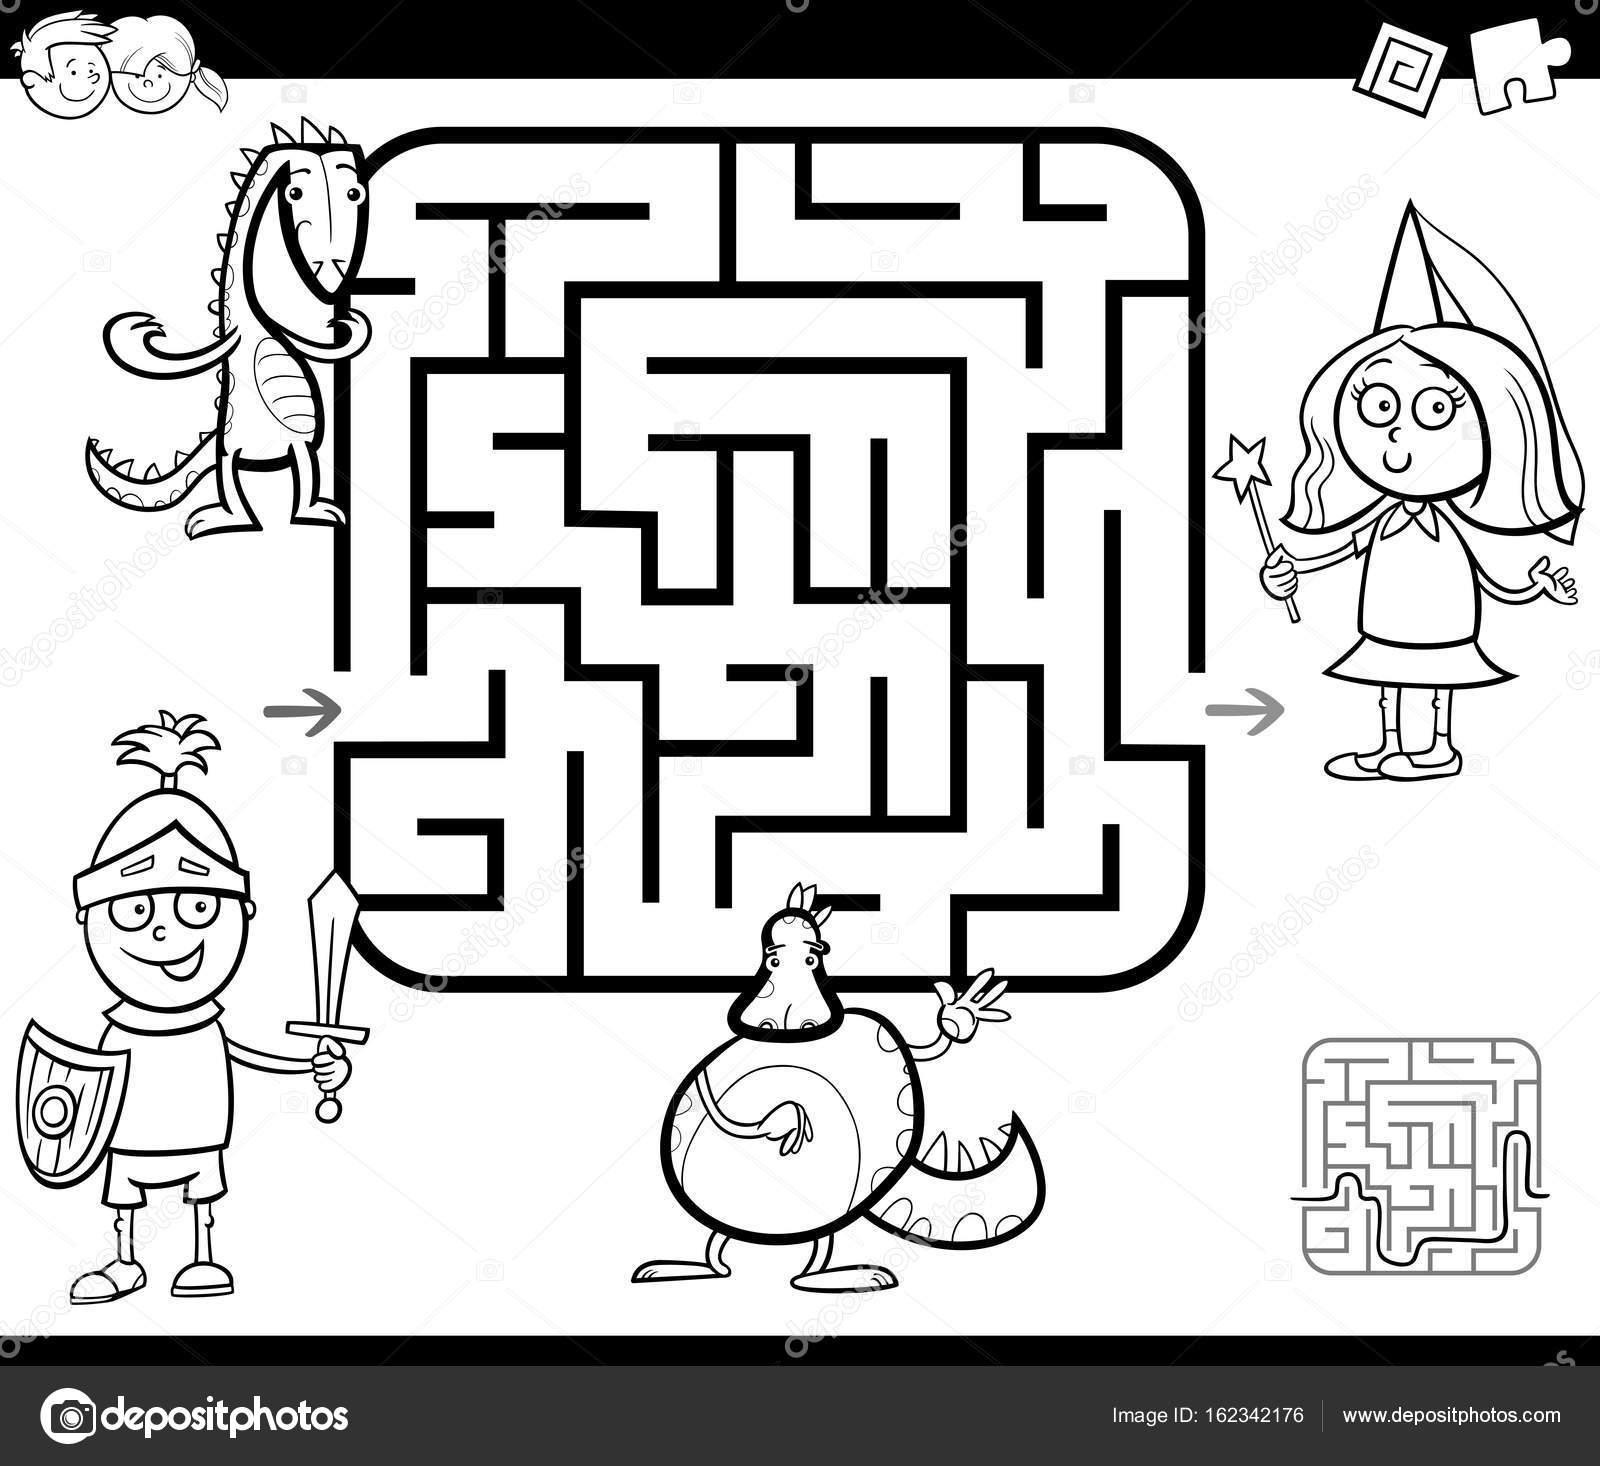 Aktivität-Labyrinth-Spiel mit Fantasy-Charaktere — Stockvektor ...